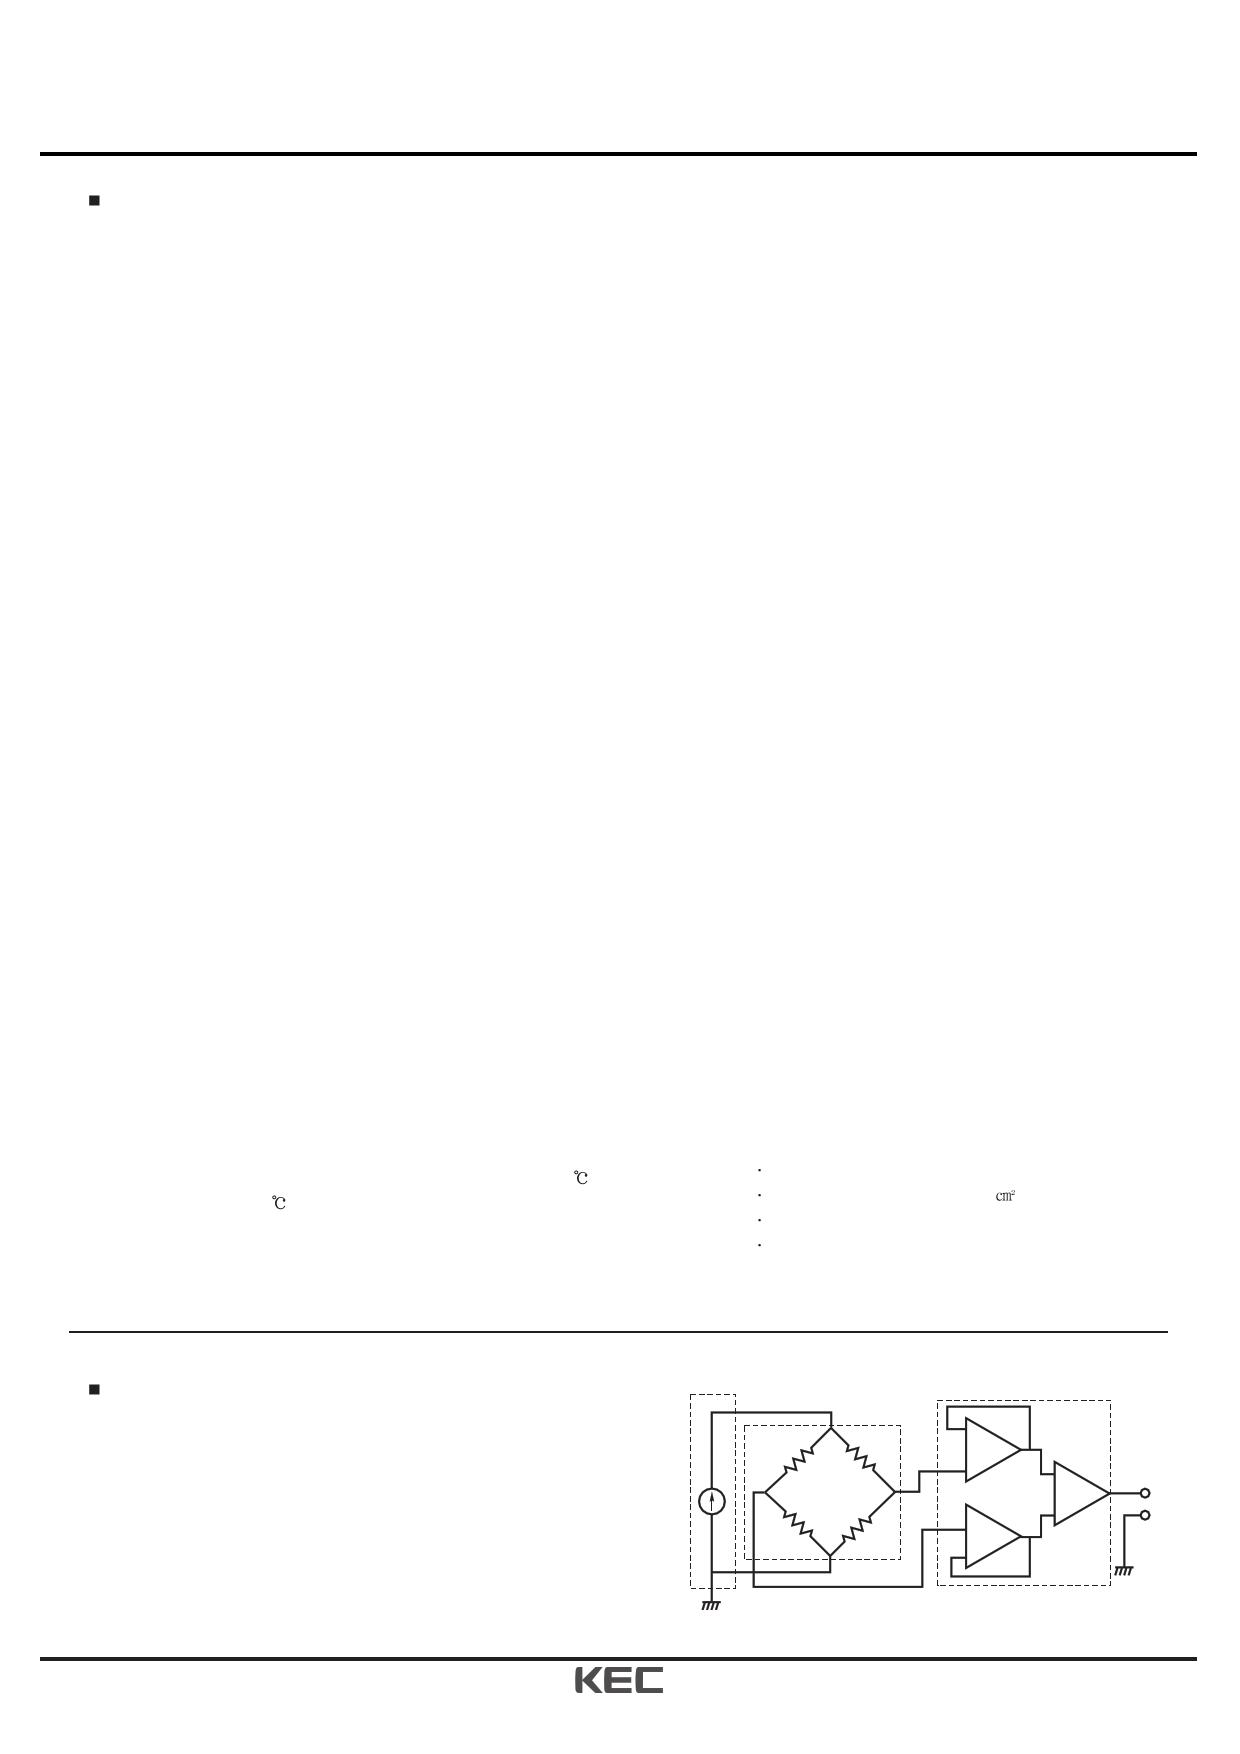 KPF801G01 pdf, 반도체, 판매, 대치품